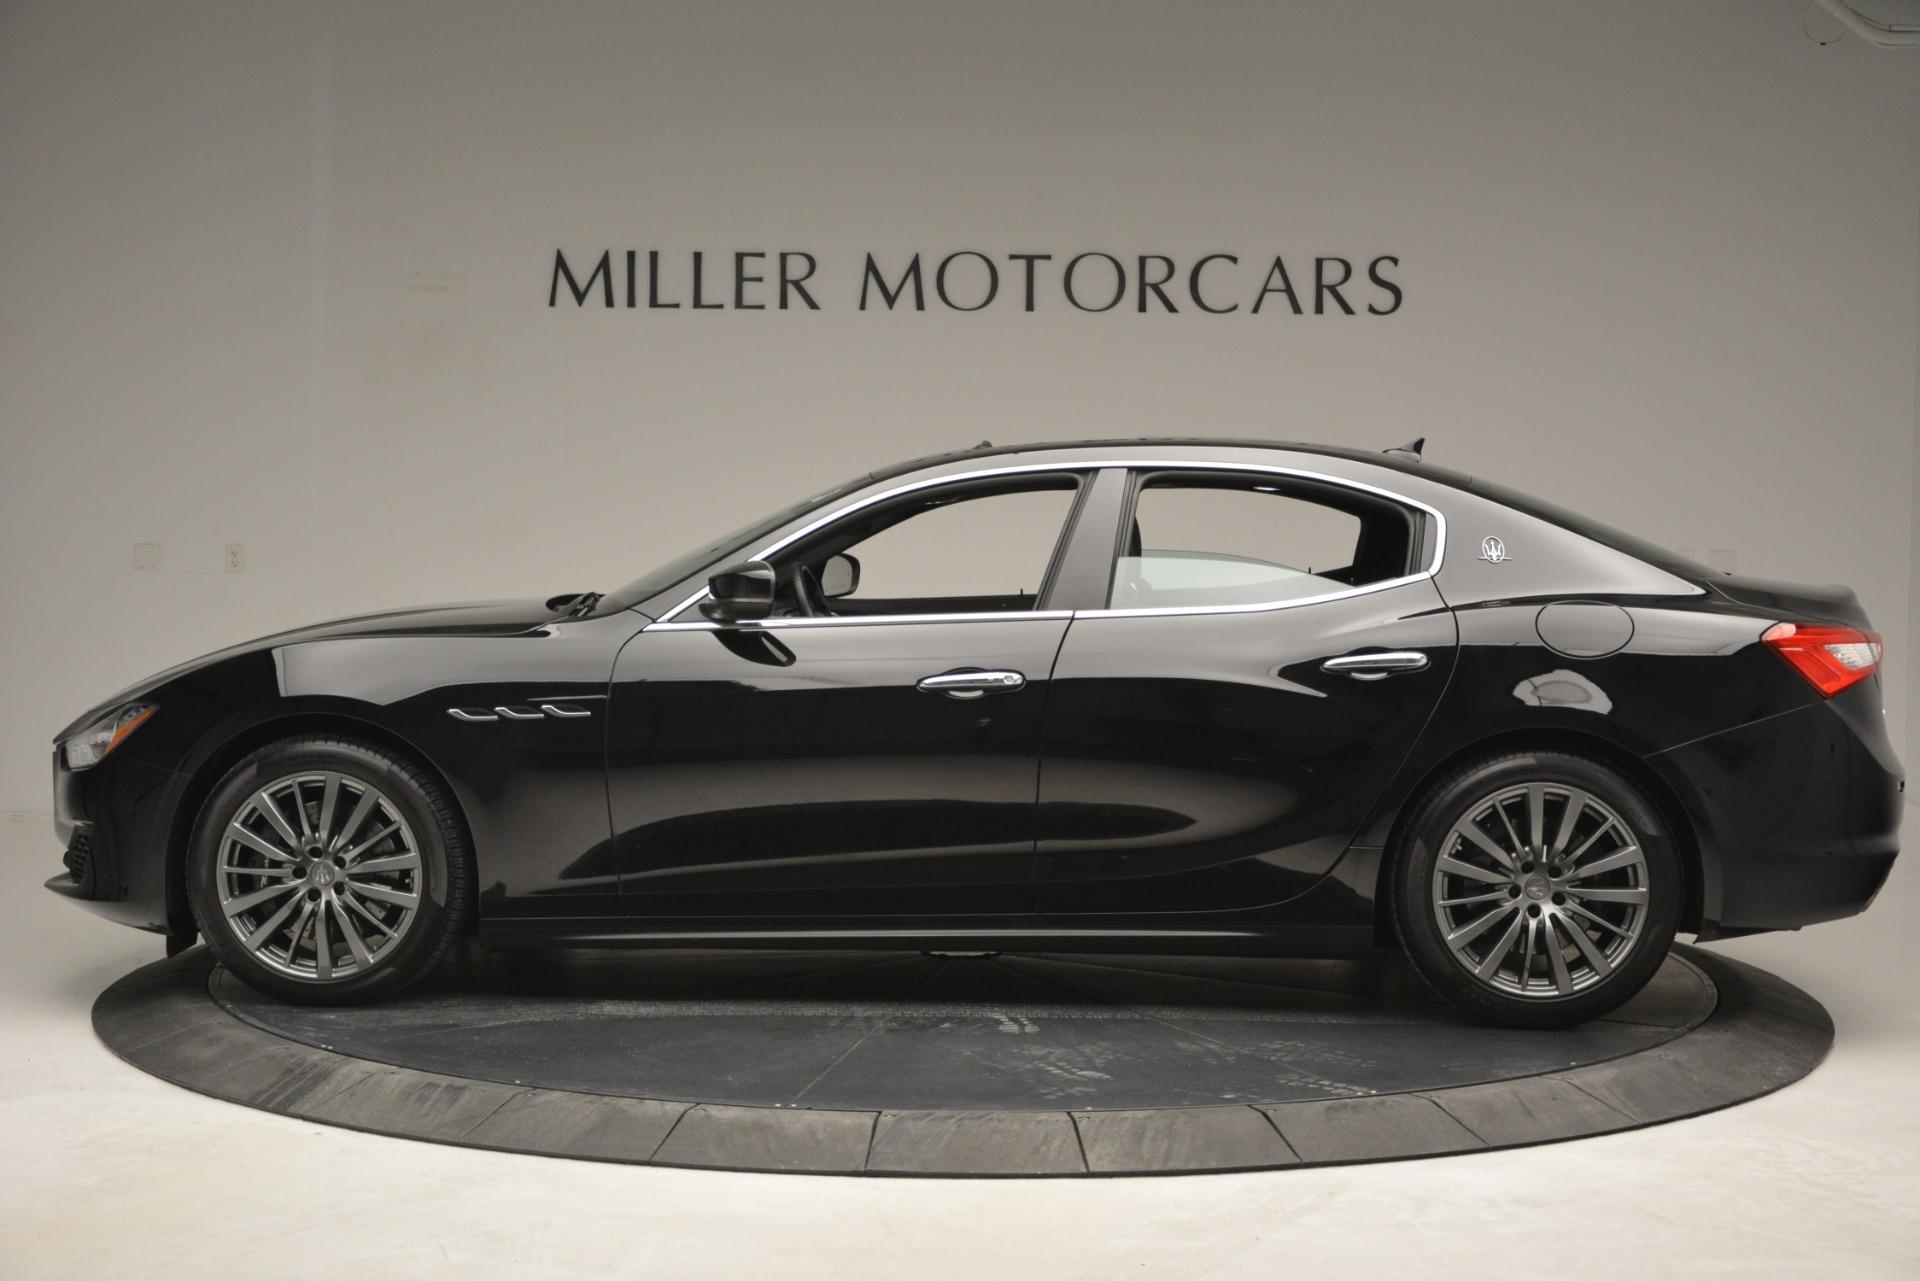 Used 2018 Maserati Ghibli S Q4 For Sale In Greenwich, CT. Alfa Romeo of Greenwich, 7481 2944_p4